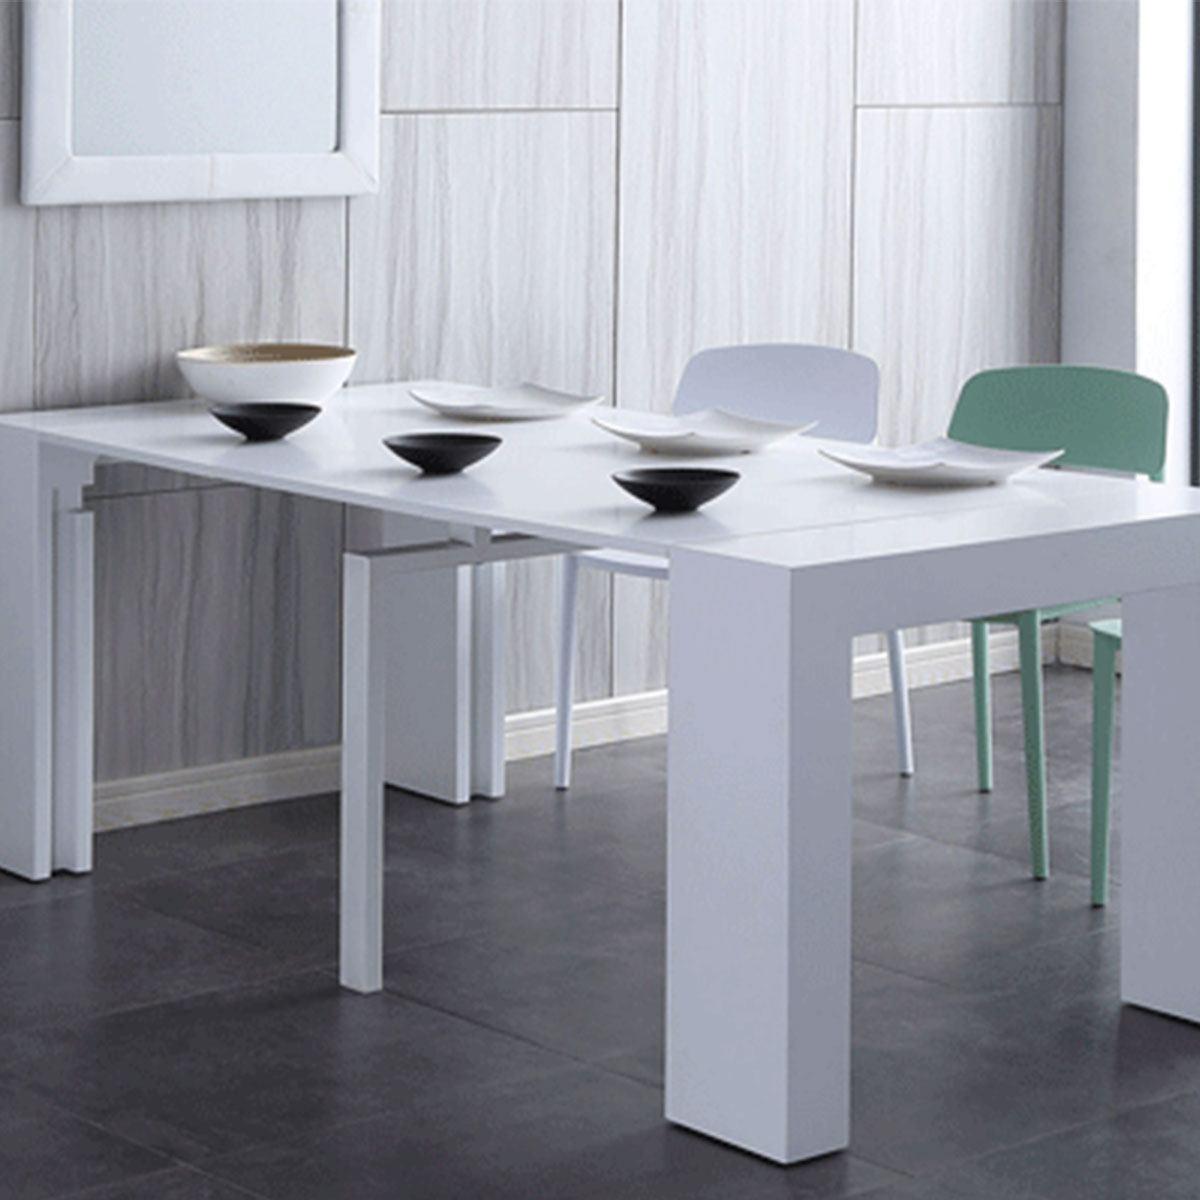 Consola / mesa extensible en color blanco - Artikalia